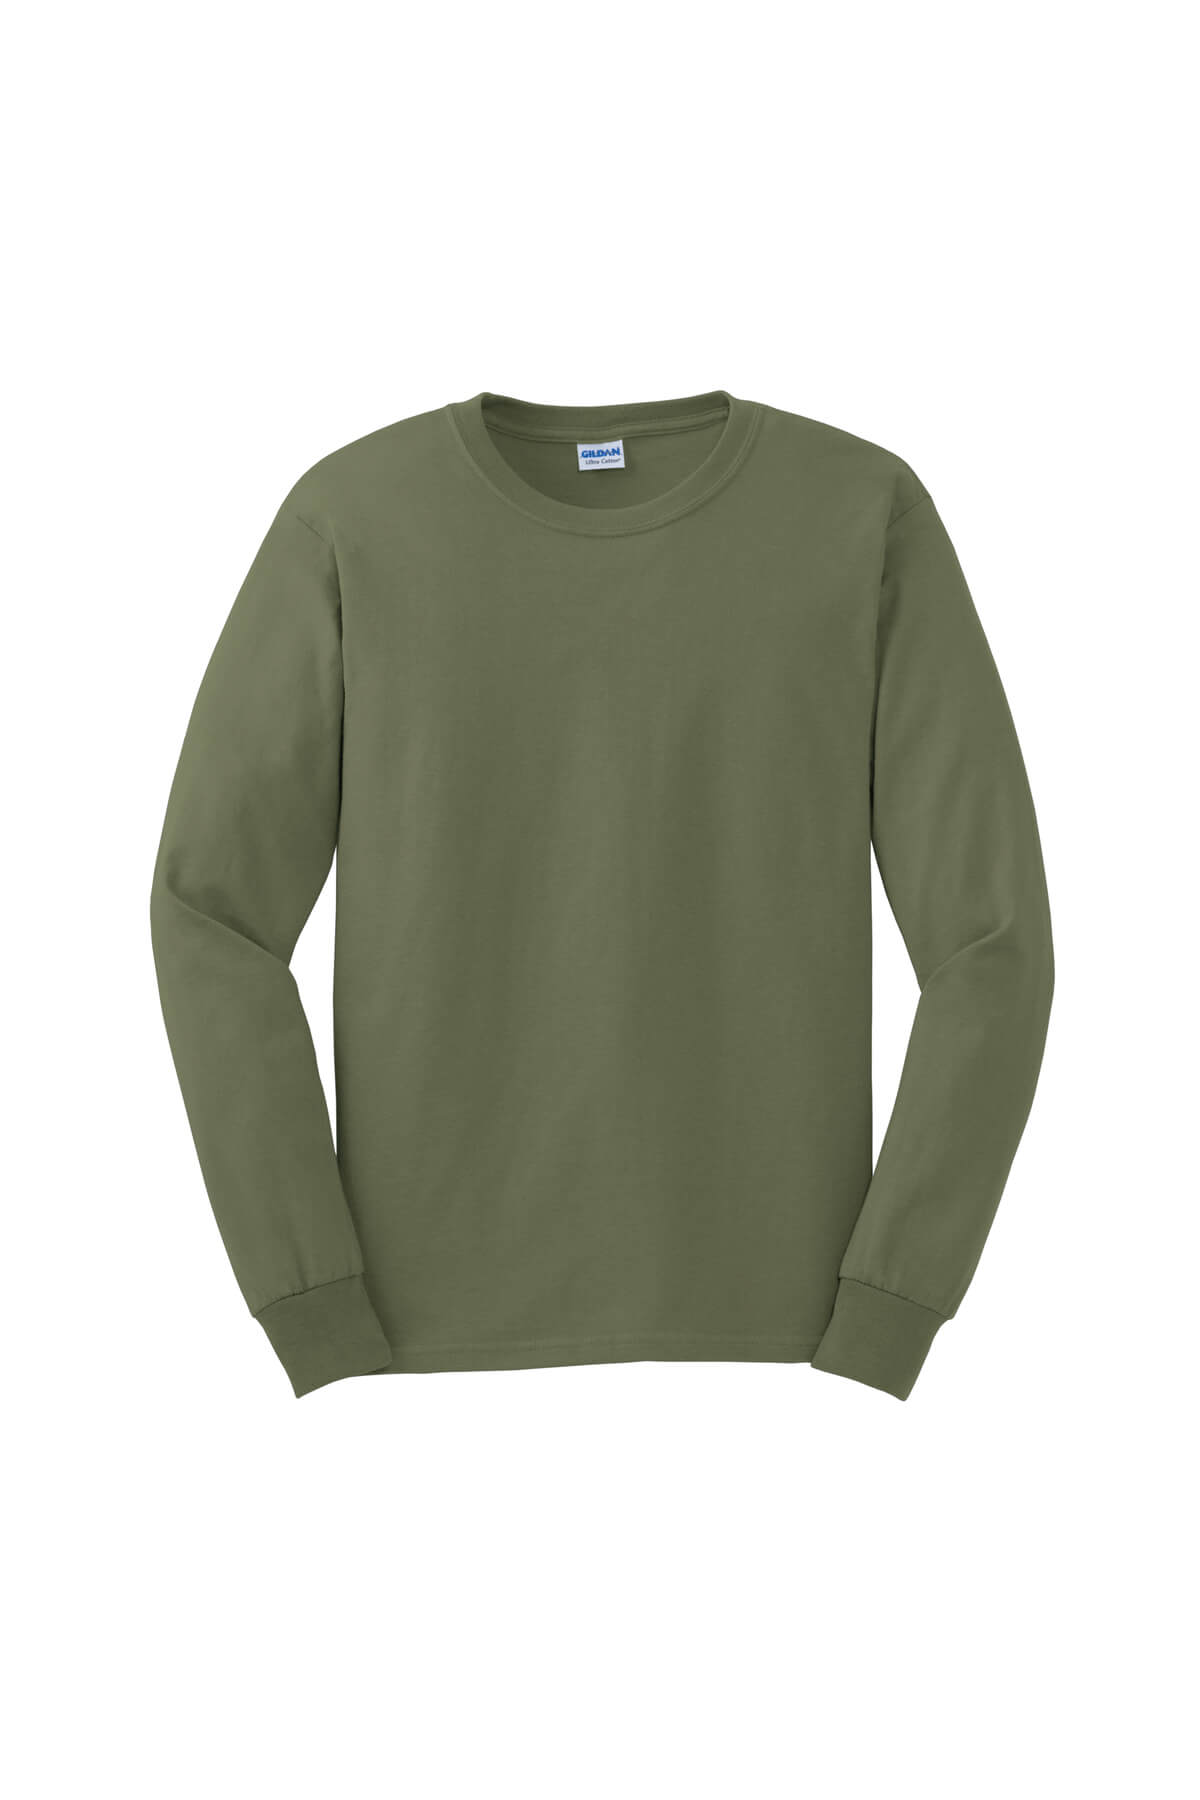 g2400-military-green-5